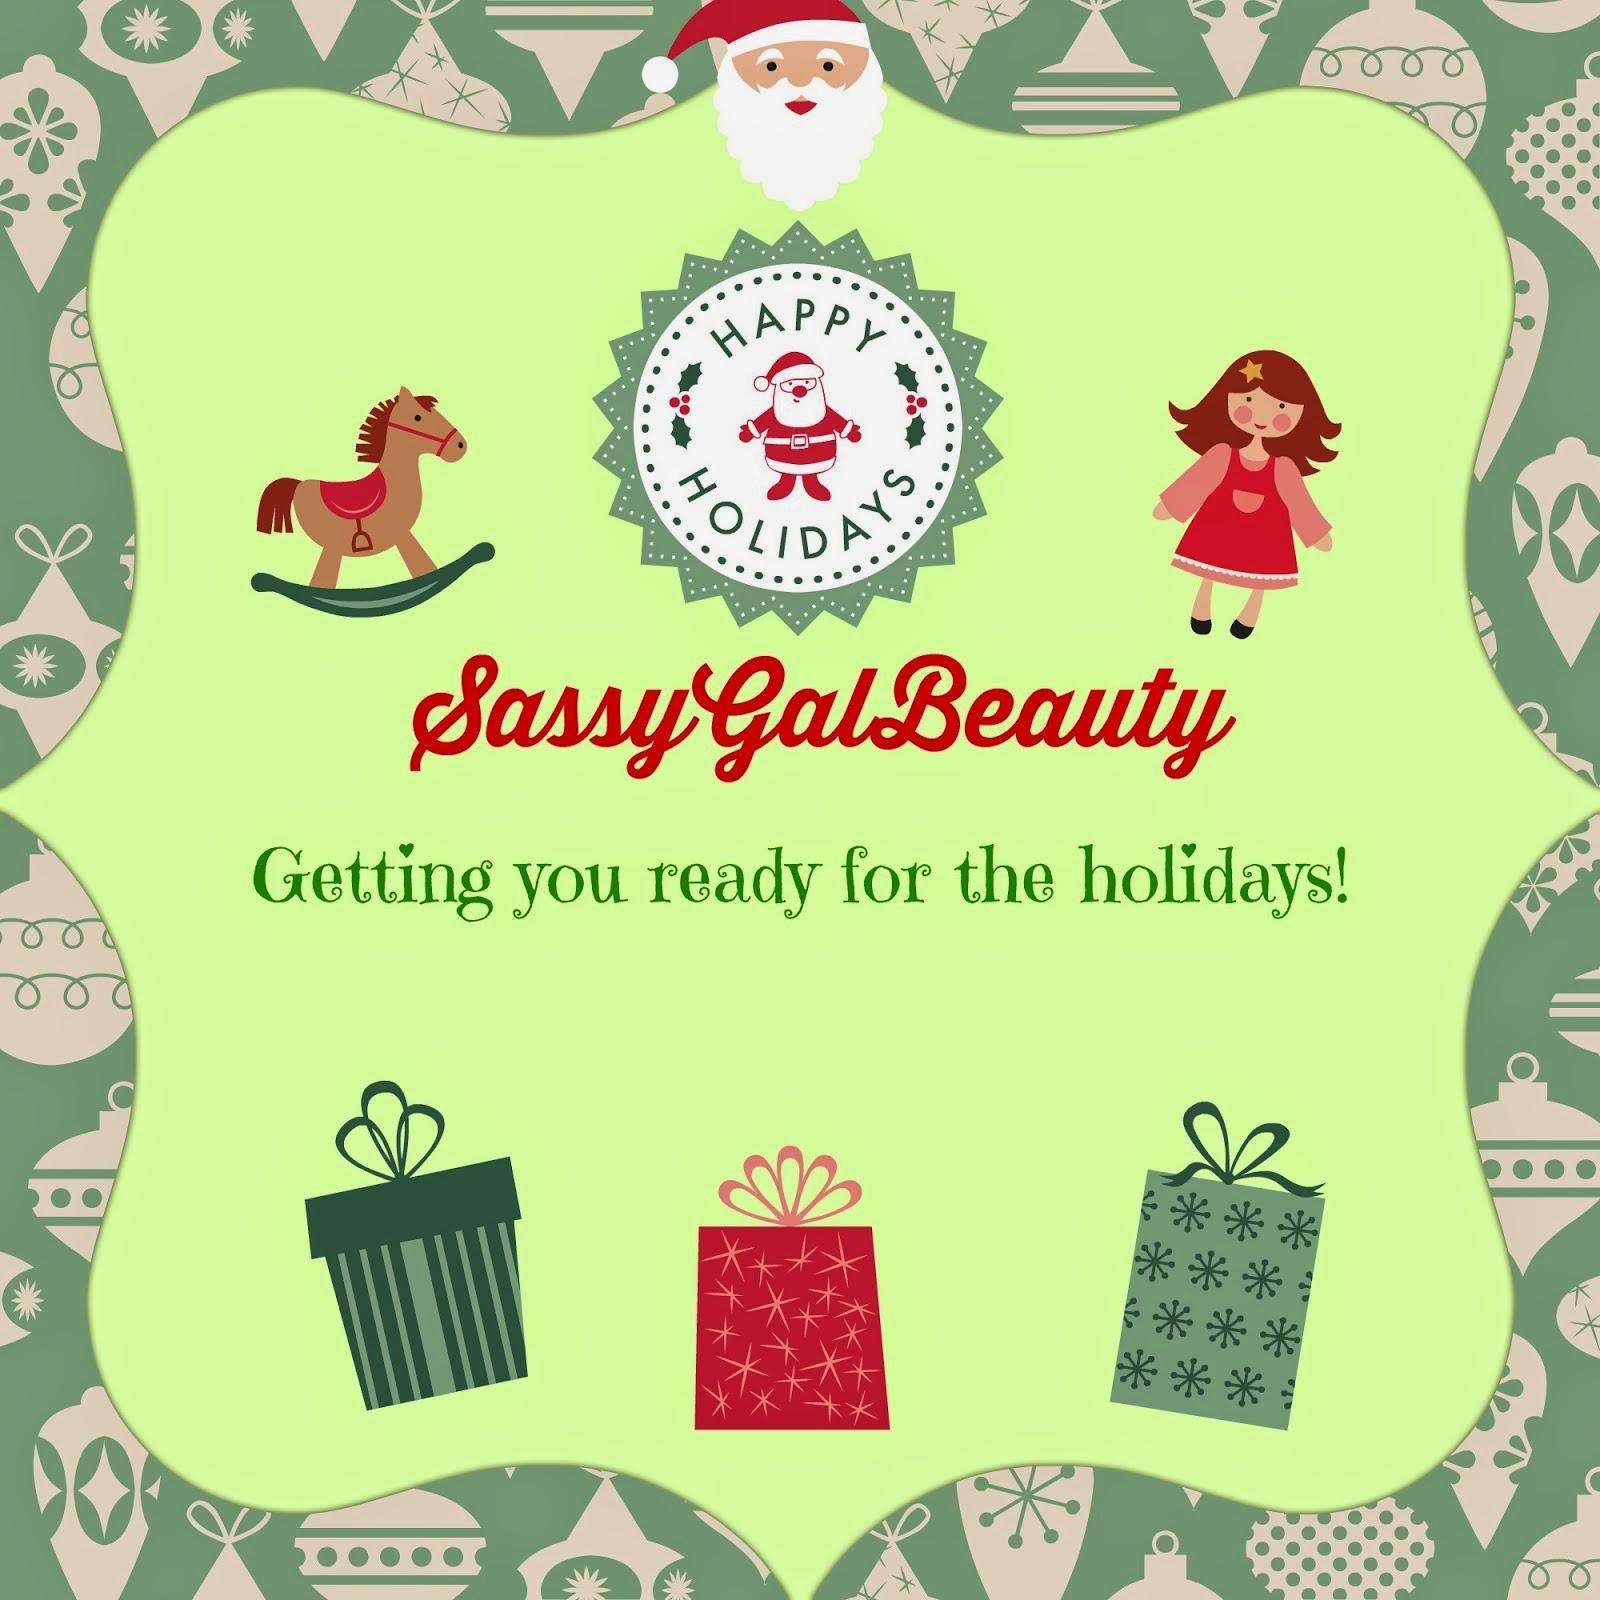 SassyGalBeauty SassyHolidays Gift Guide